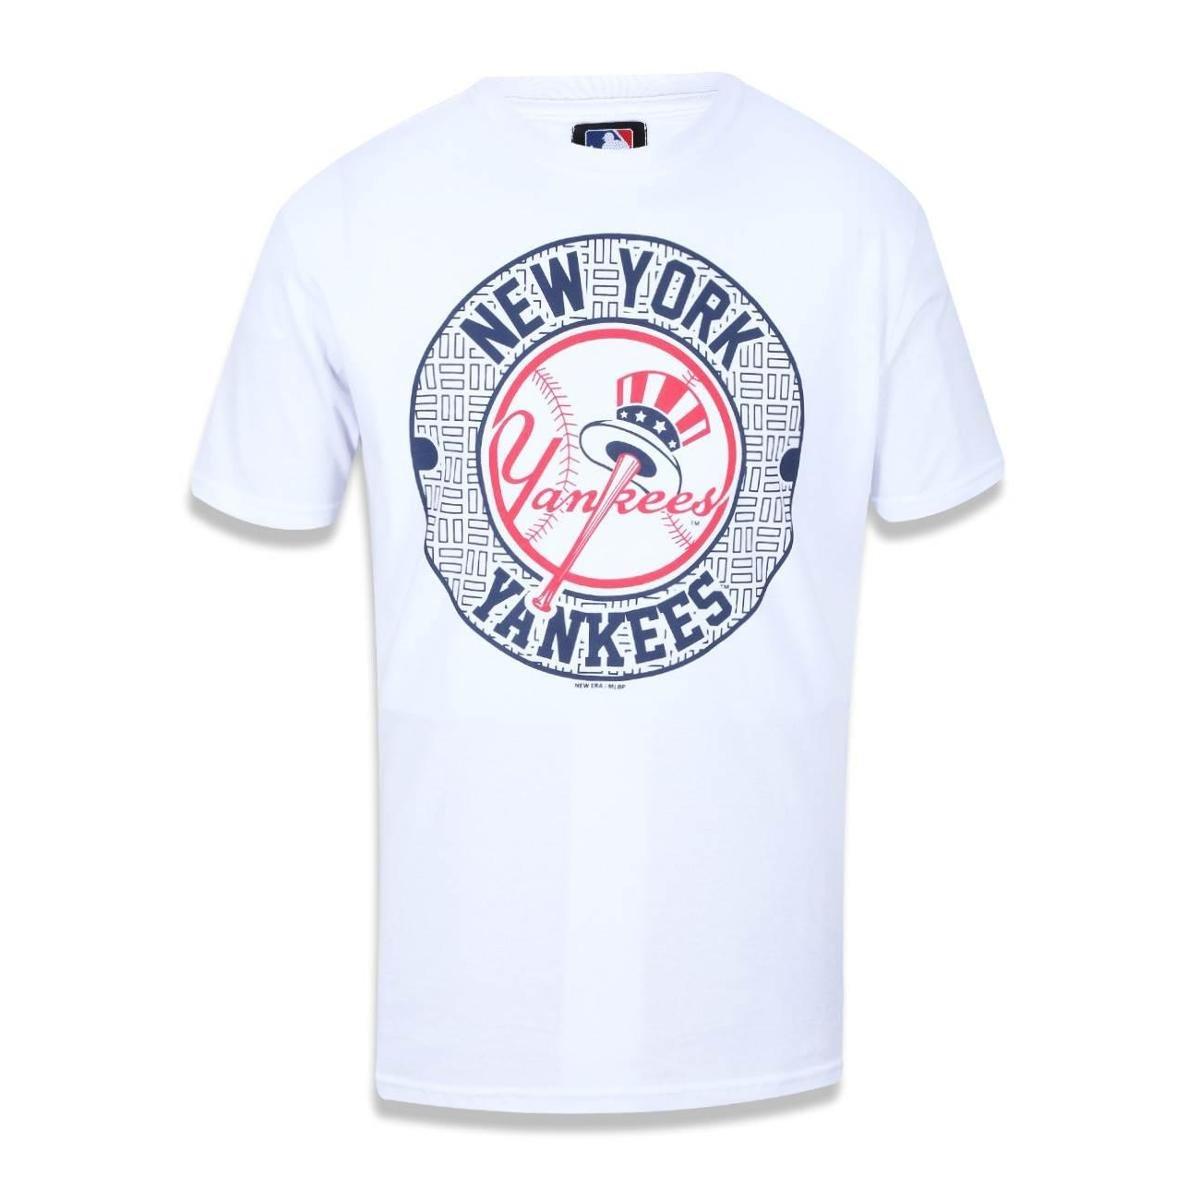 Camiseta New York Yankees MLB New Era Masculina - Compre Agora ... 5de35e09dbb